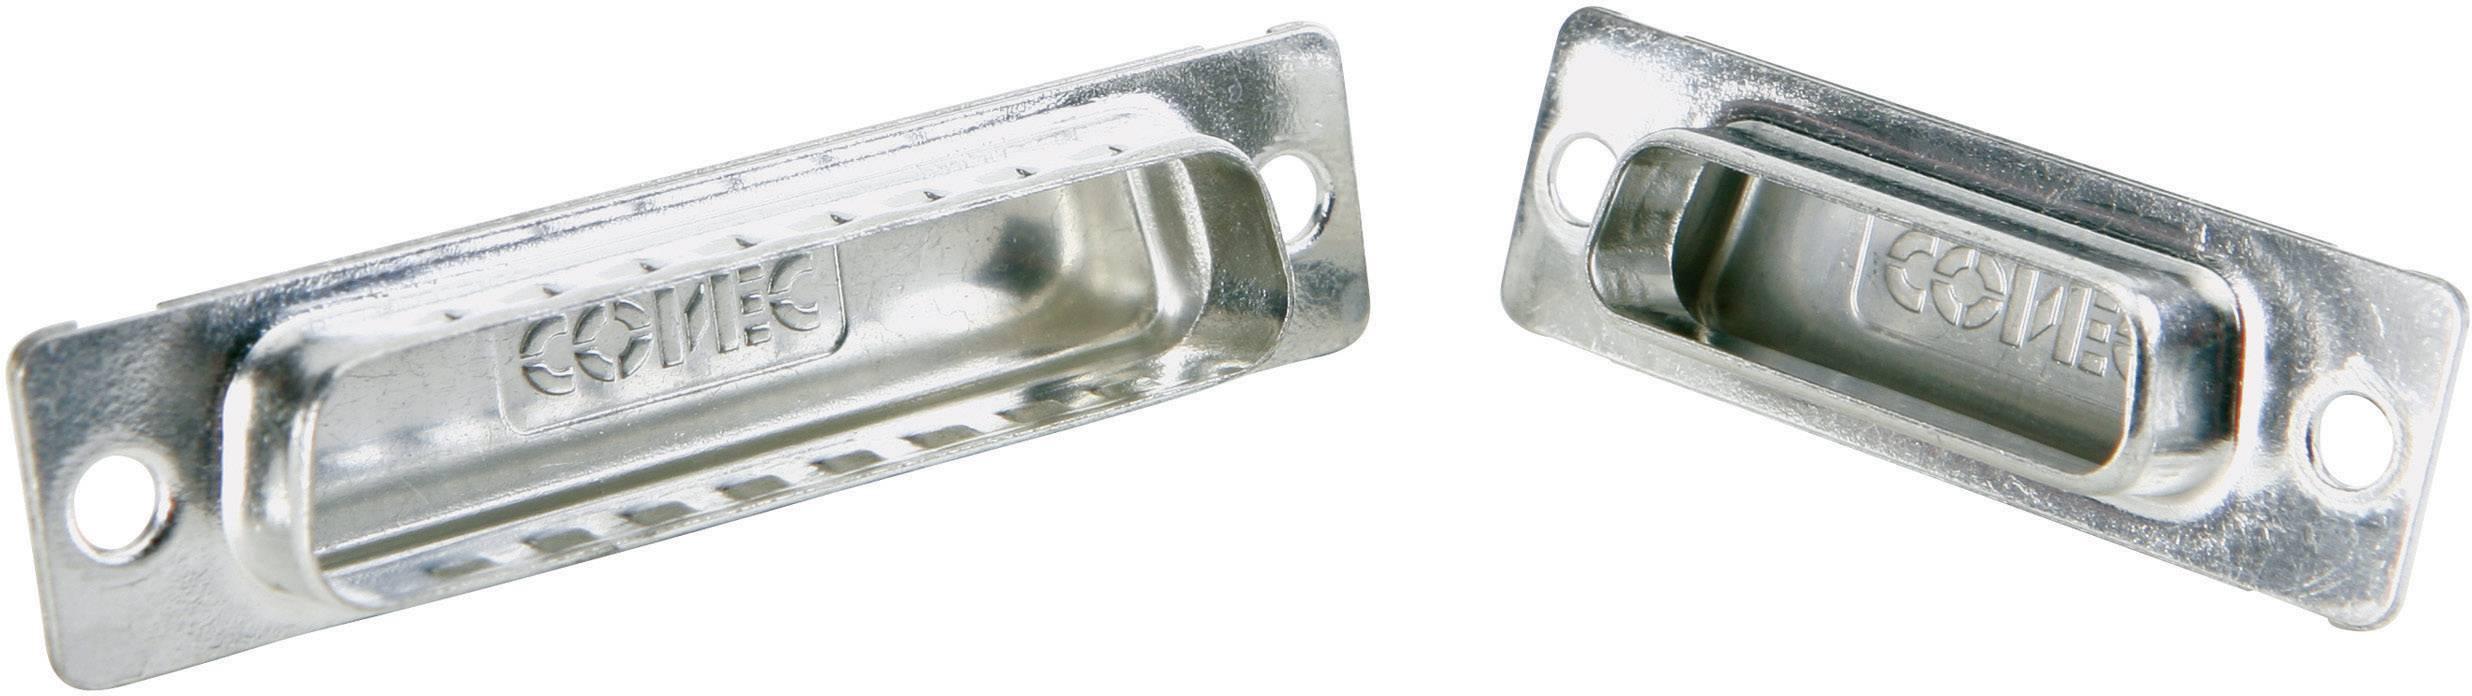 Záslepka D-SUB konektoru Conec 165X12999X pro 37pólovou D-SUB zásuvku, stříbrná, 1 ks